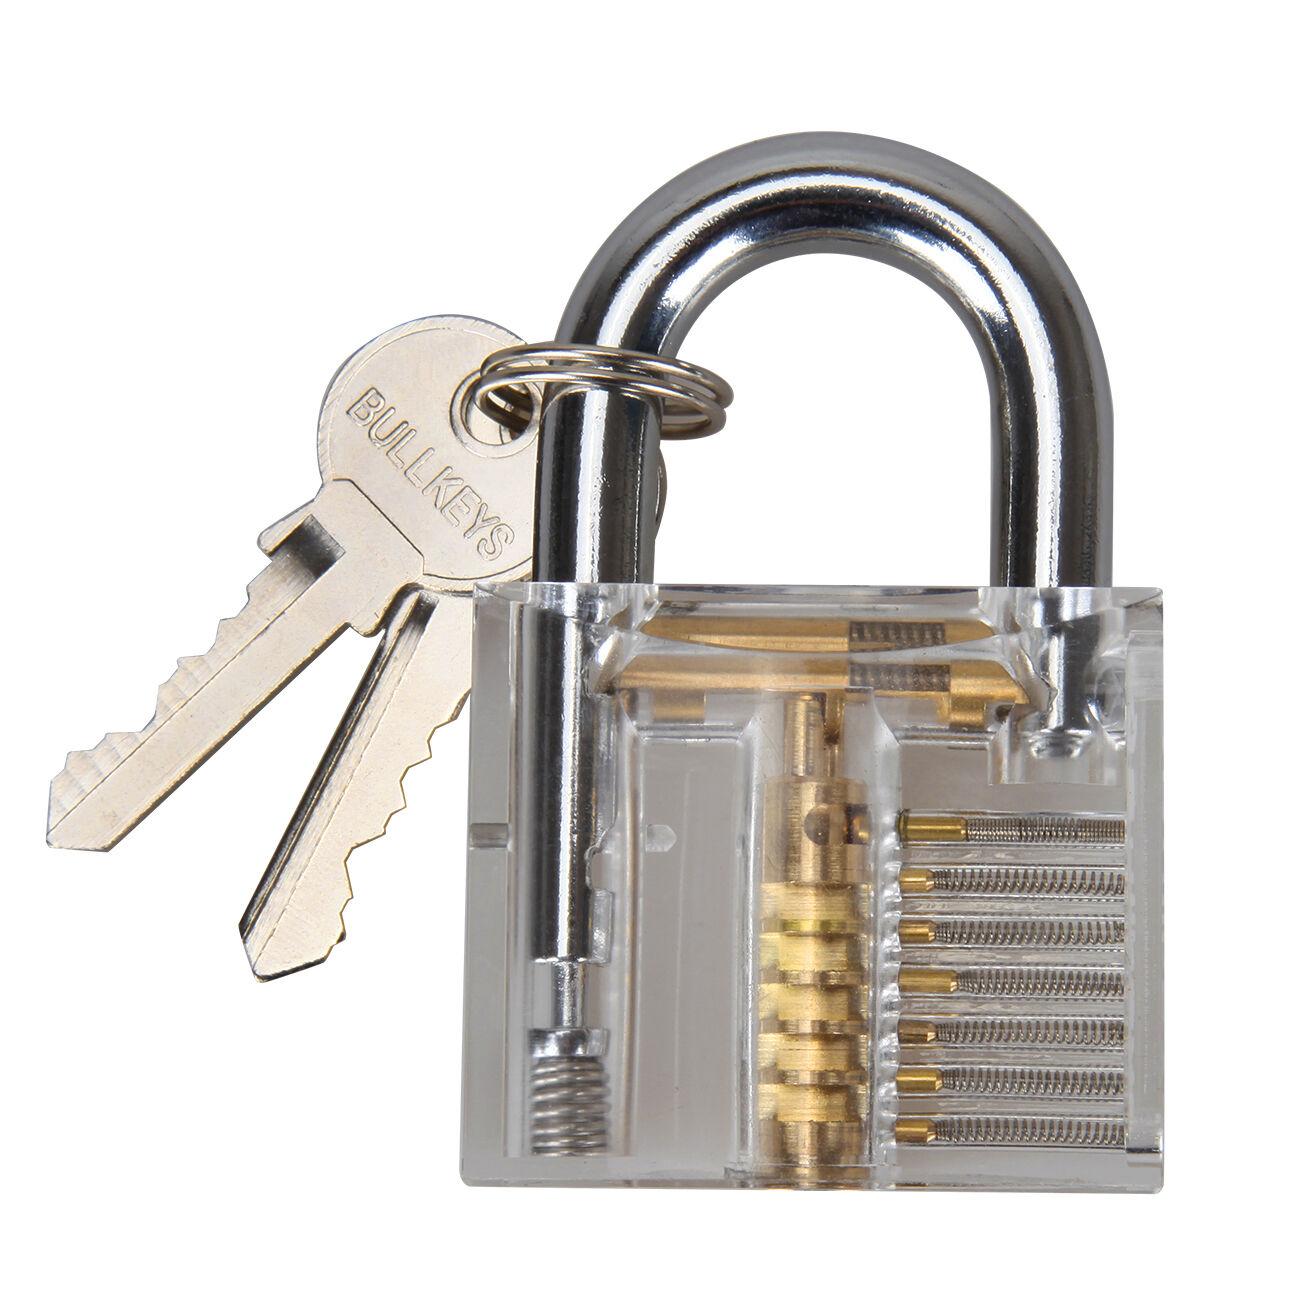 Practice Transparent Cutaway Visable Padlock Training Skill Pick Lock 10pcs Lockpick Tool Set Norton Secured Powered By Verisign